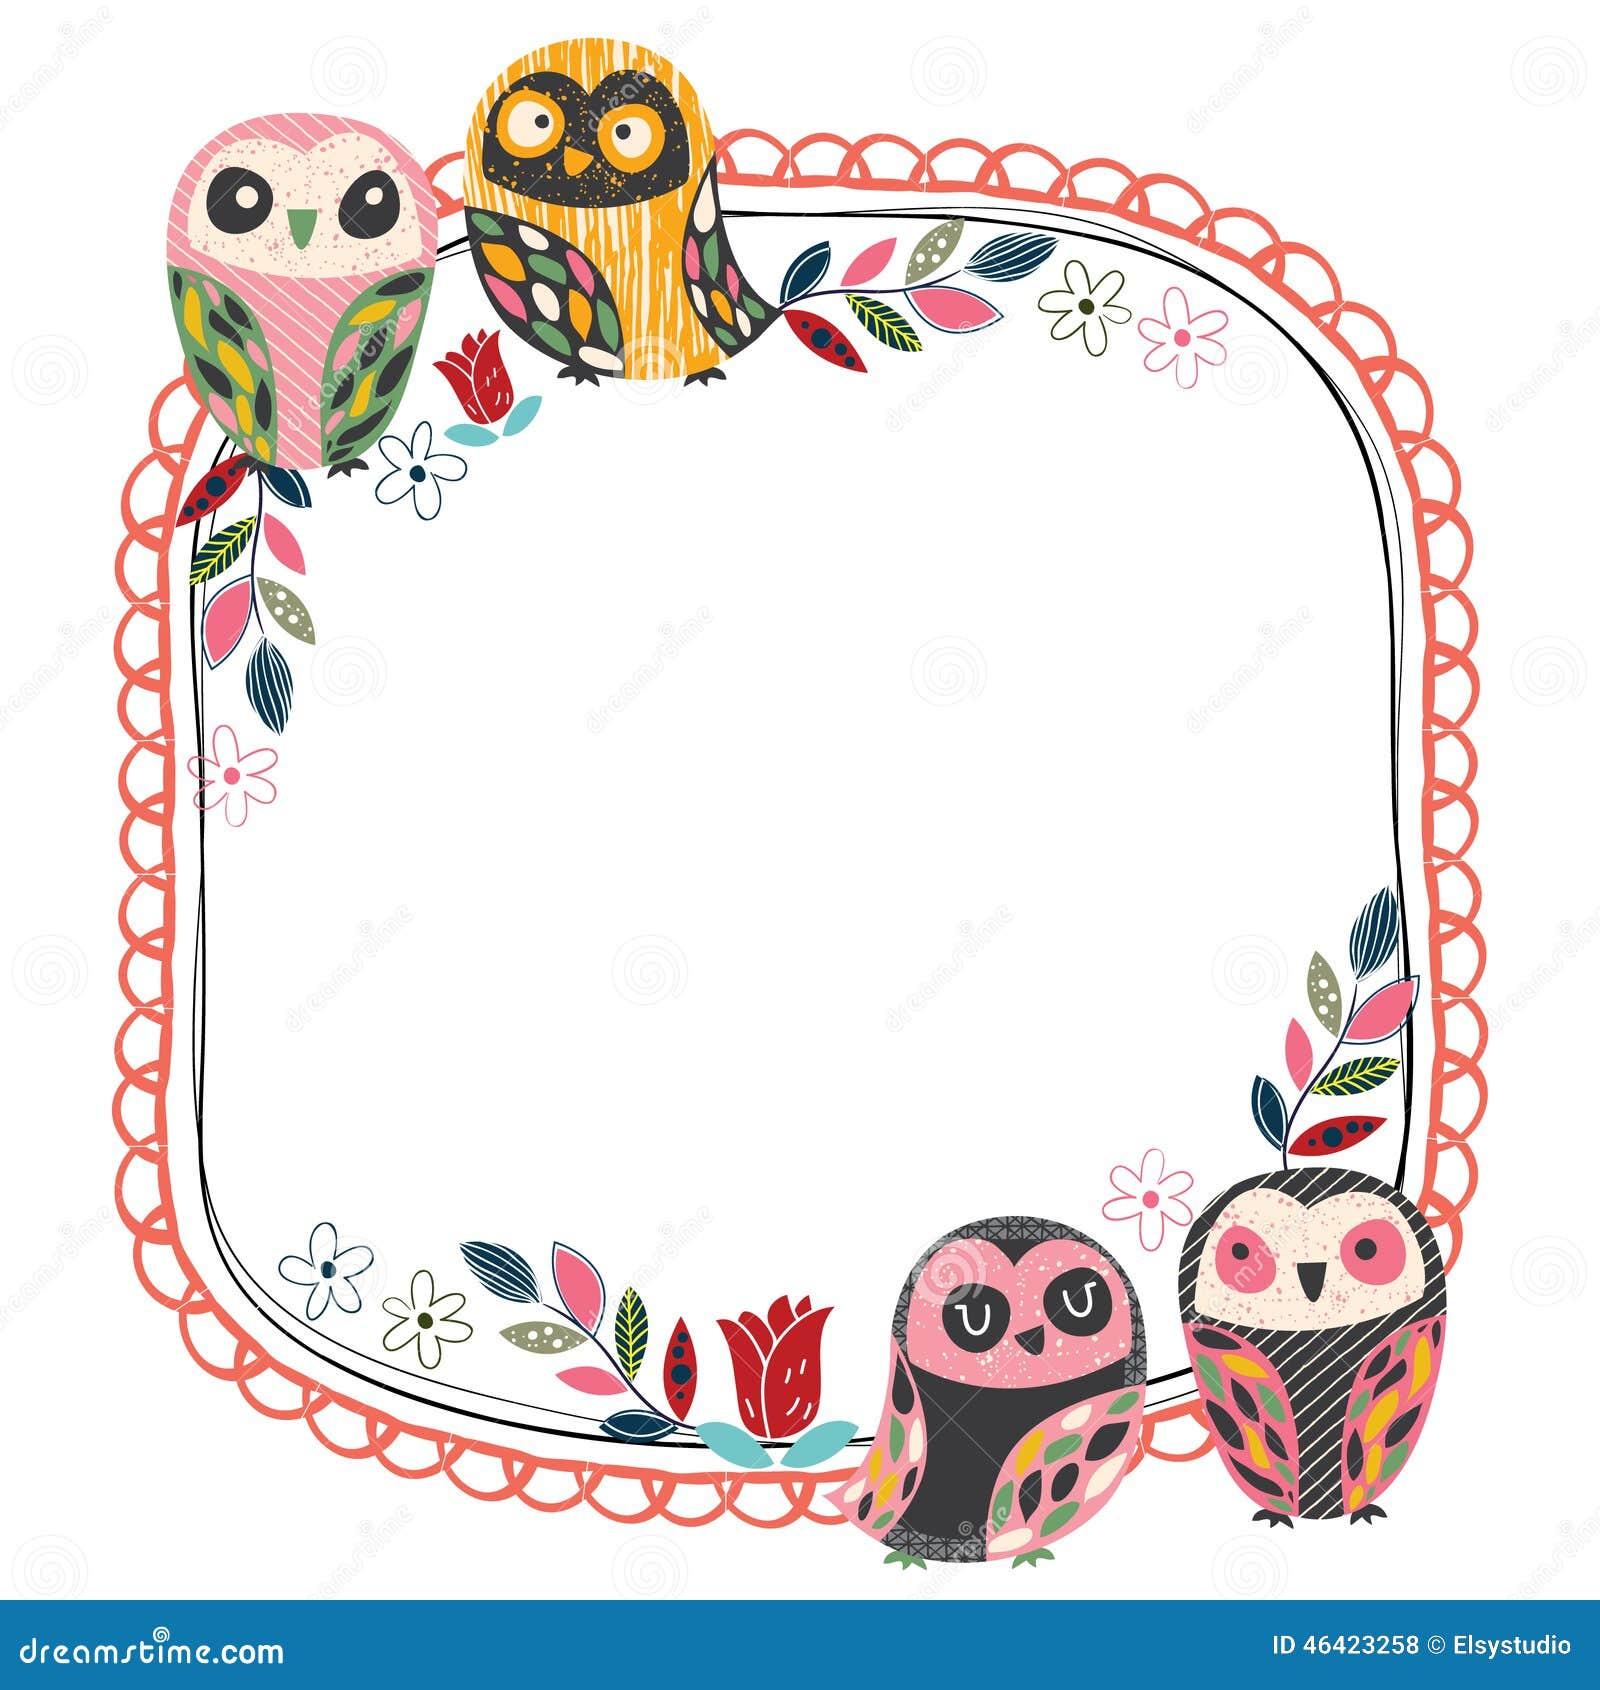 Owl Party Invitation is beautiful invitation ideas